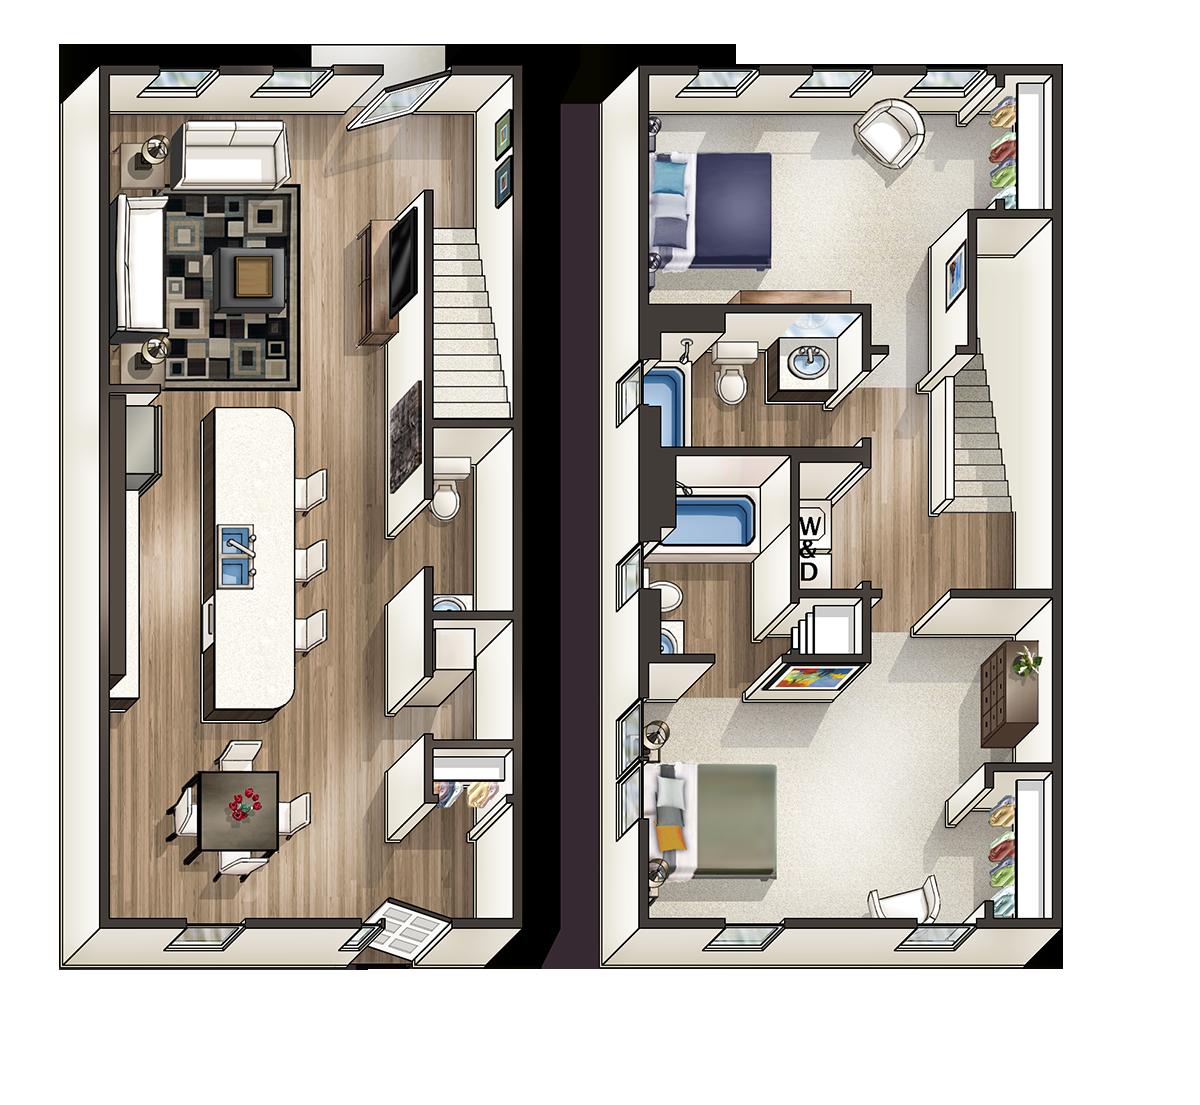 Spacious 1,412 Square Foot 2 Bedroom 2.5 Bathroom 2-floor